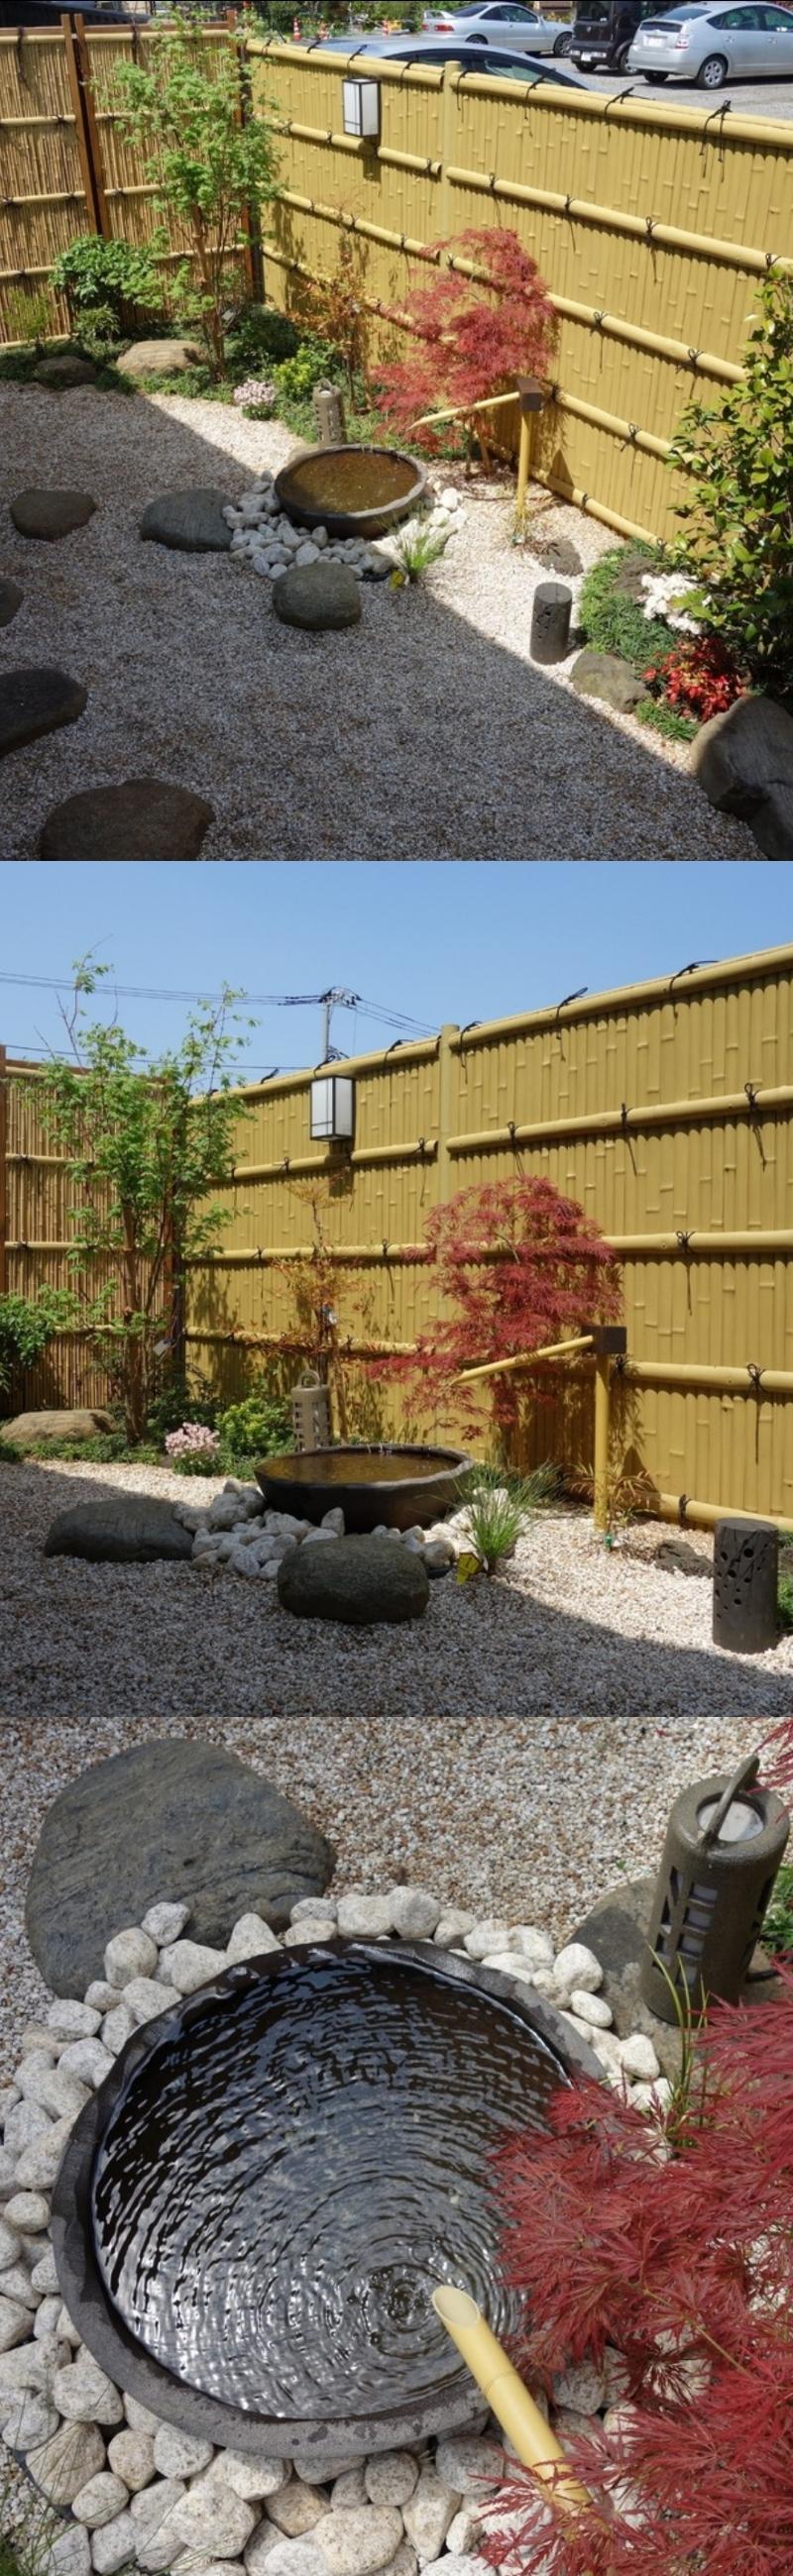 21 Beautiful Zen Garden Ideas 2019 How To Build Zen Garden Landscaping Ideas